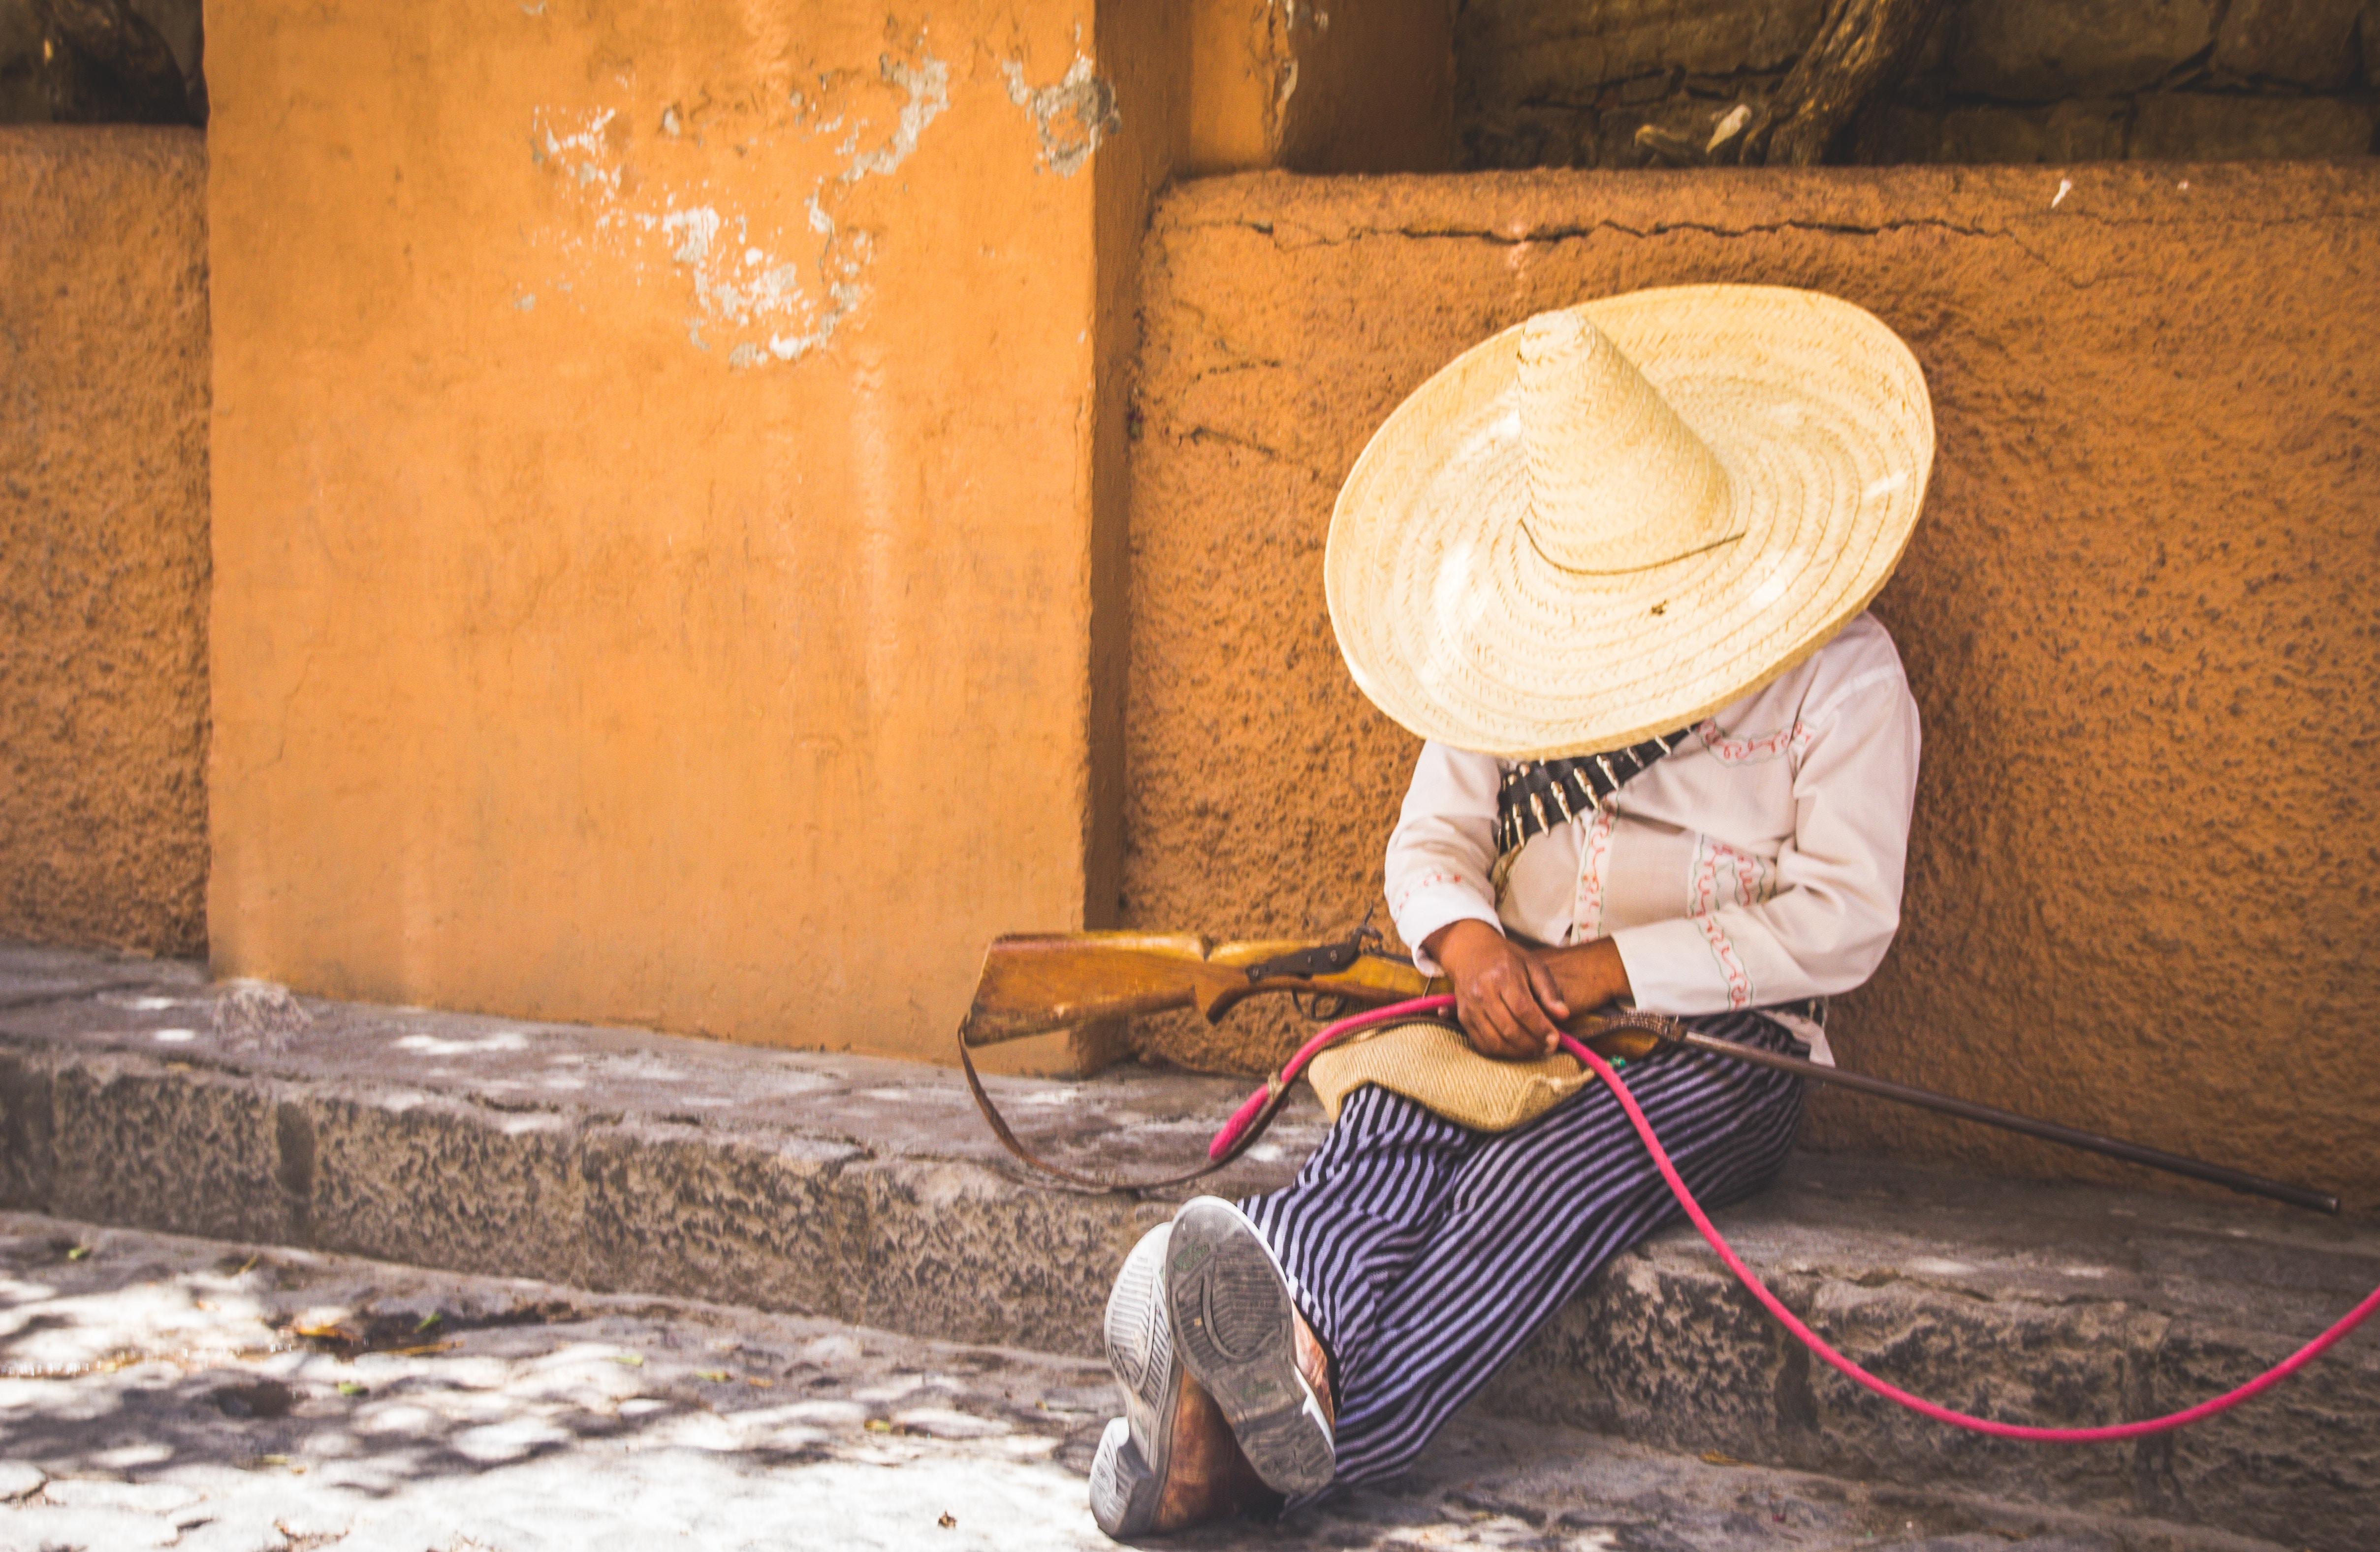 mexikaner schnaps keyvisual